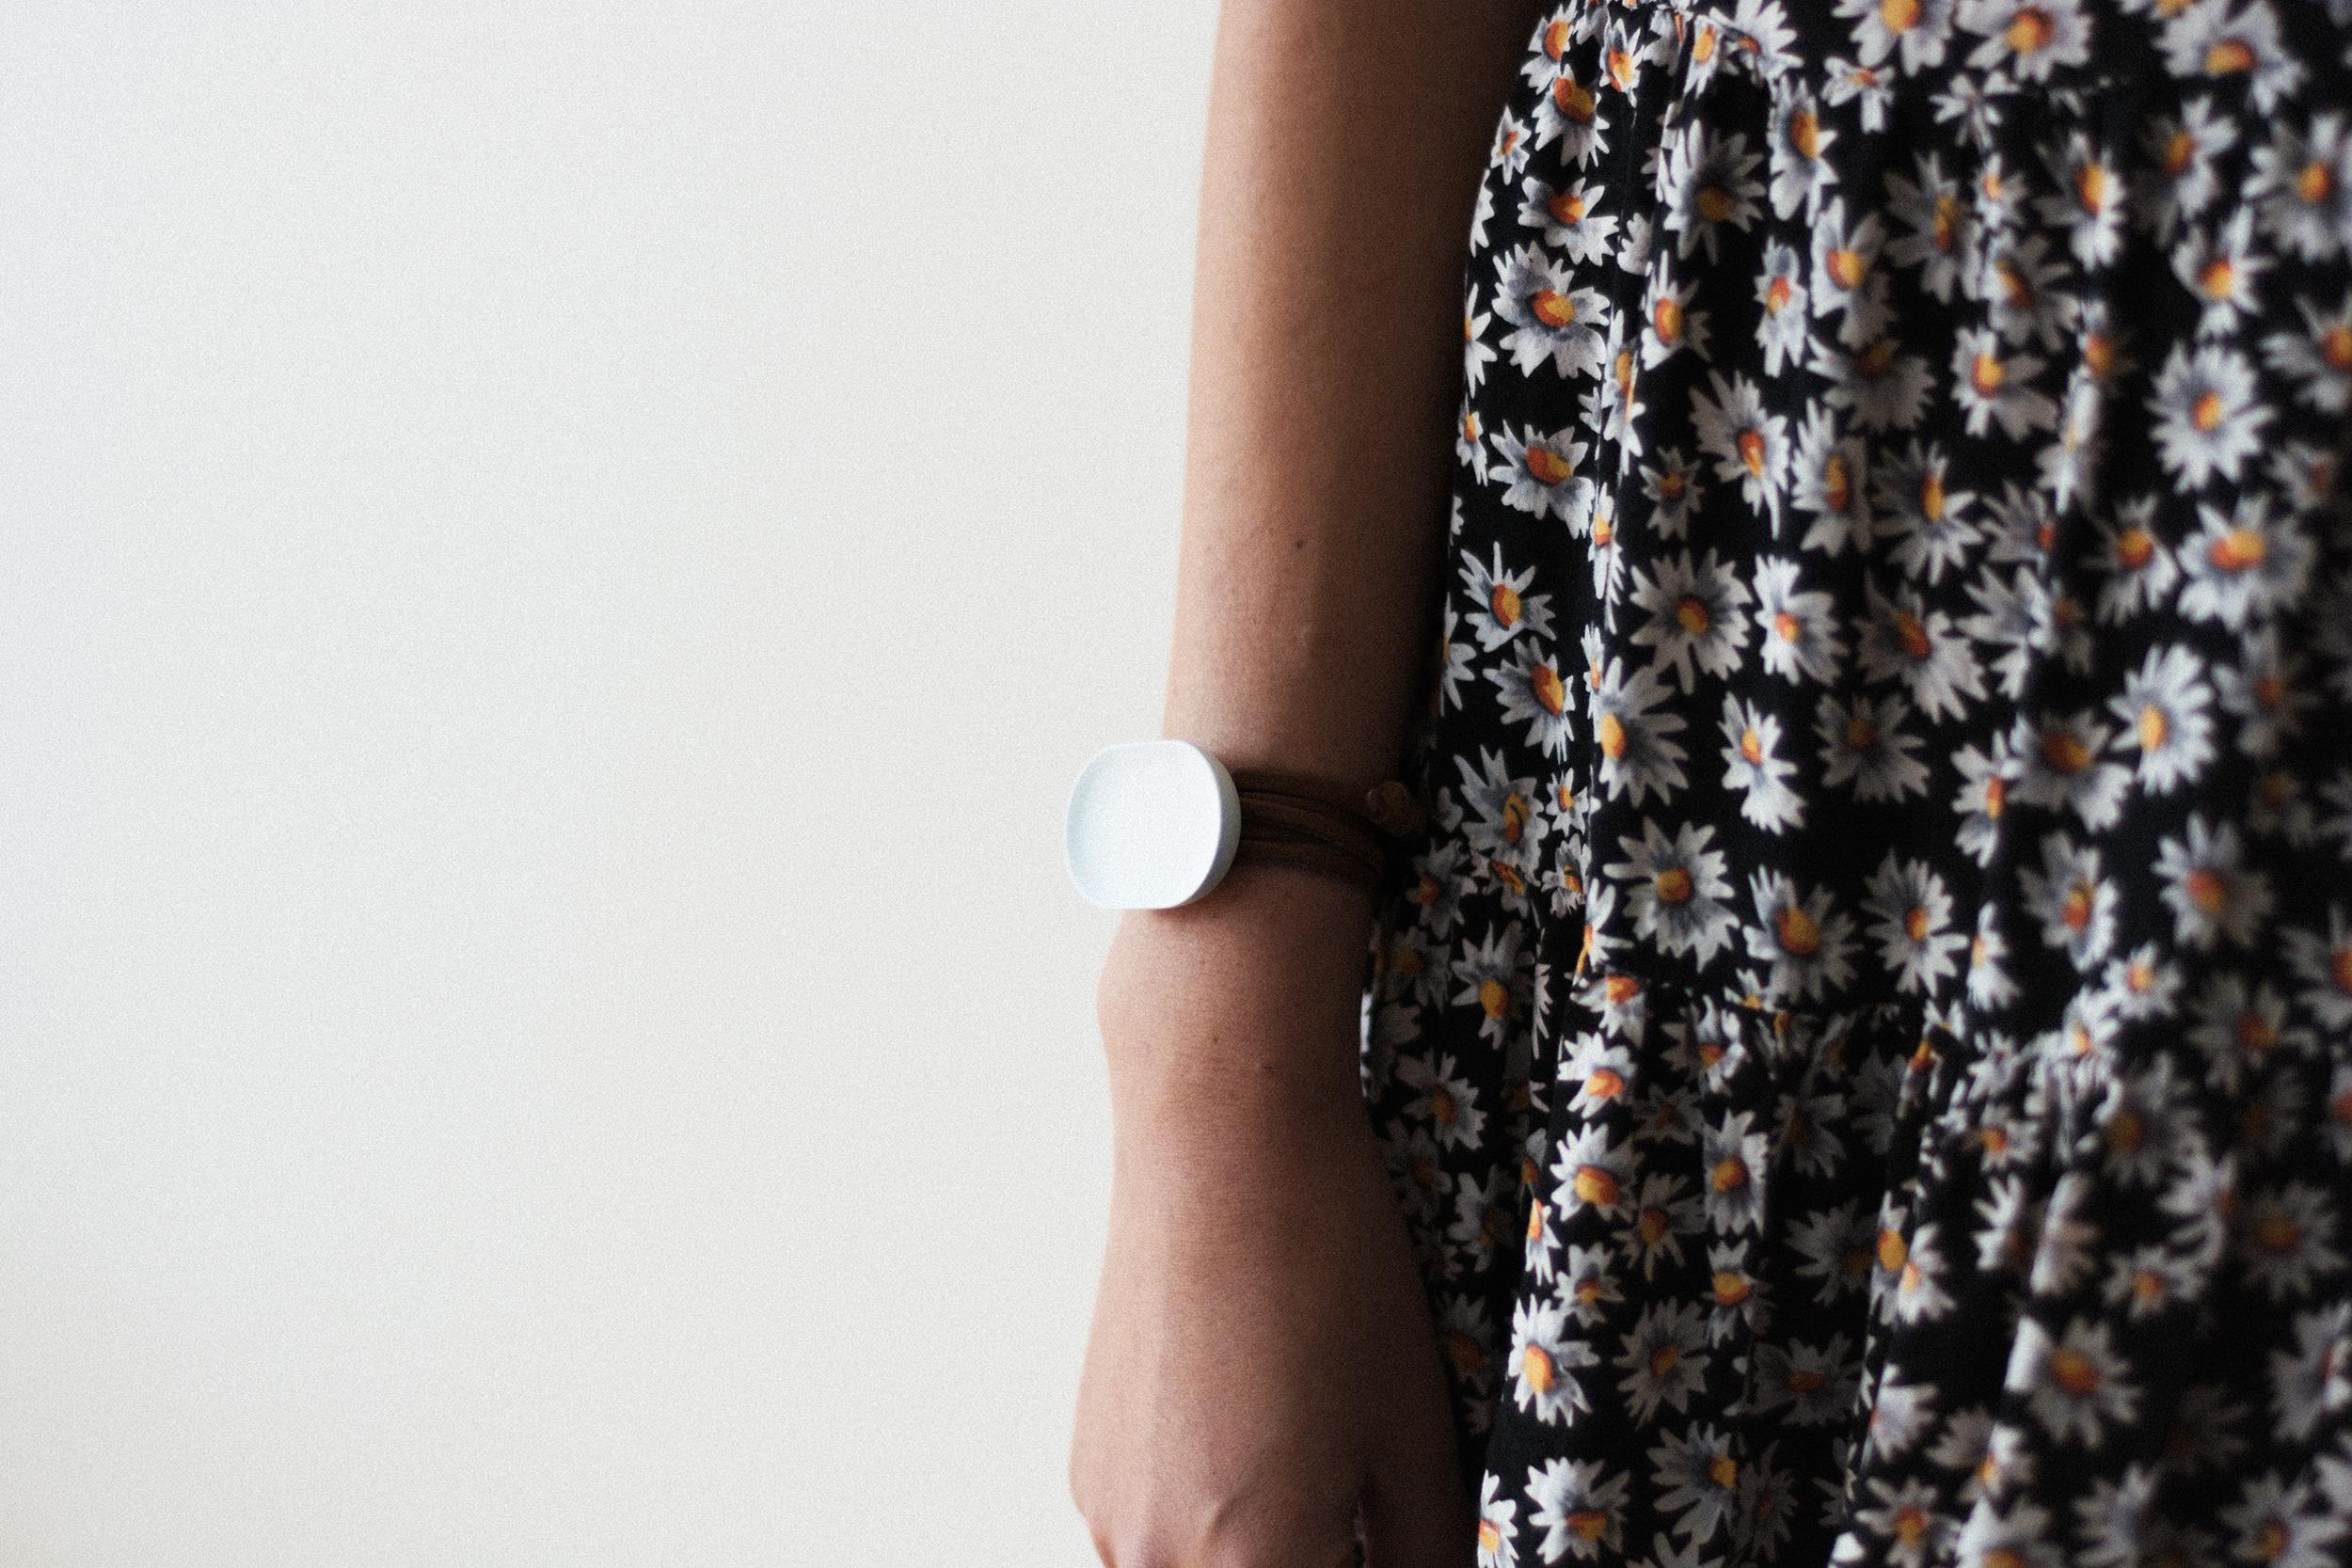 Sync Wrist.jpg